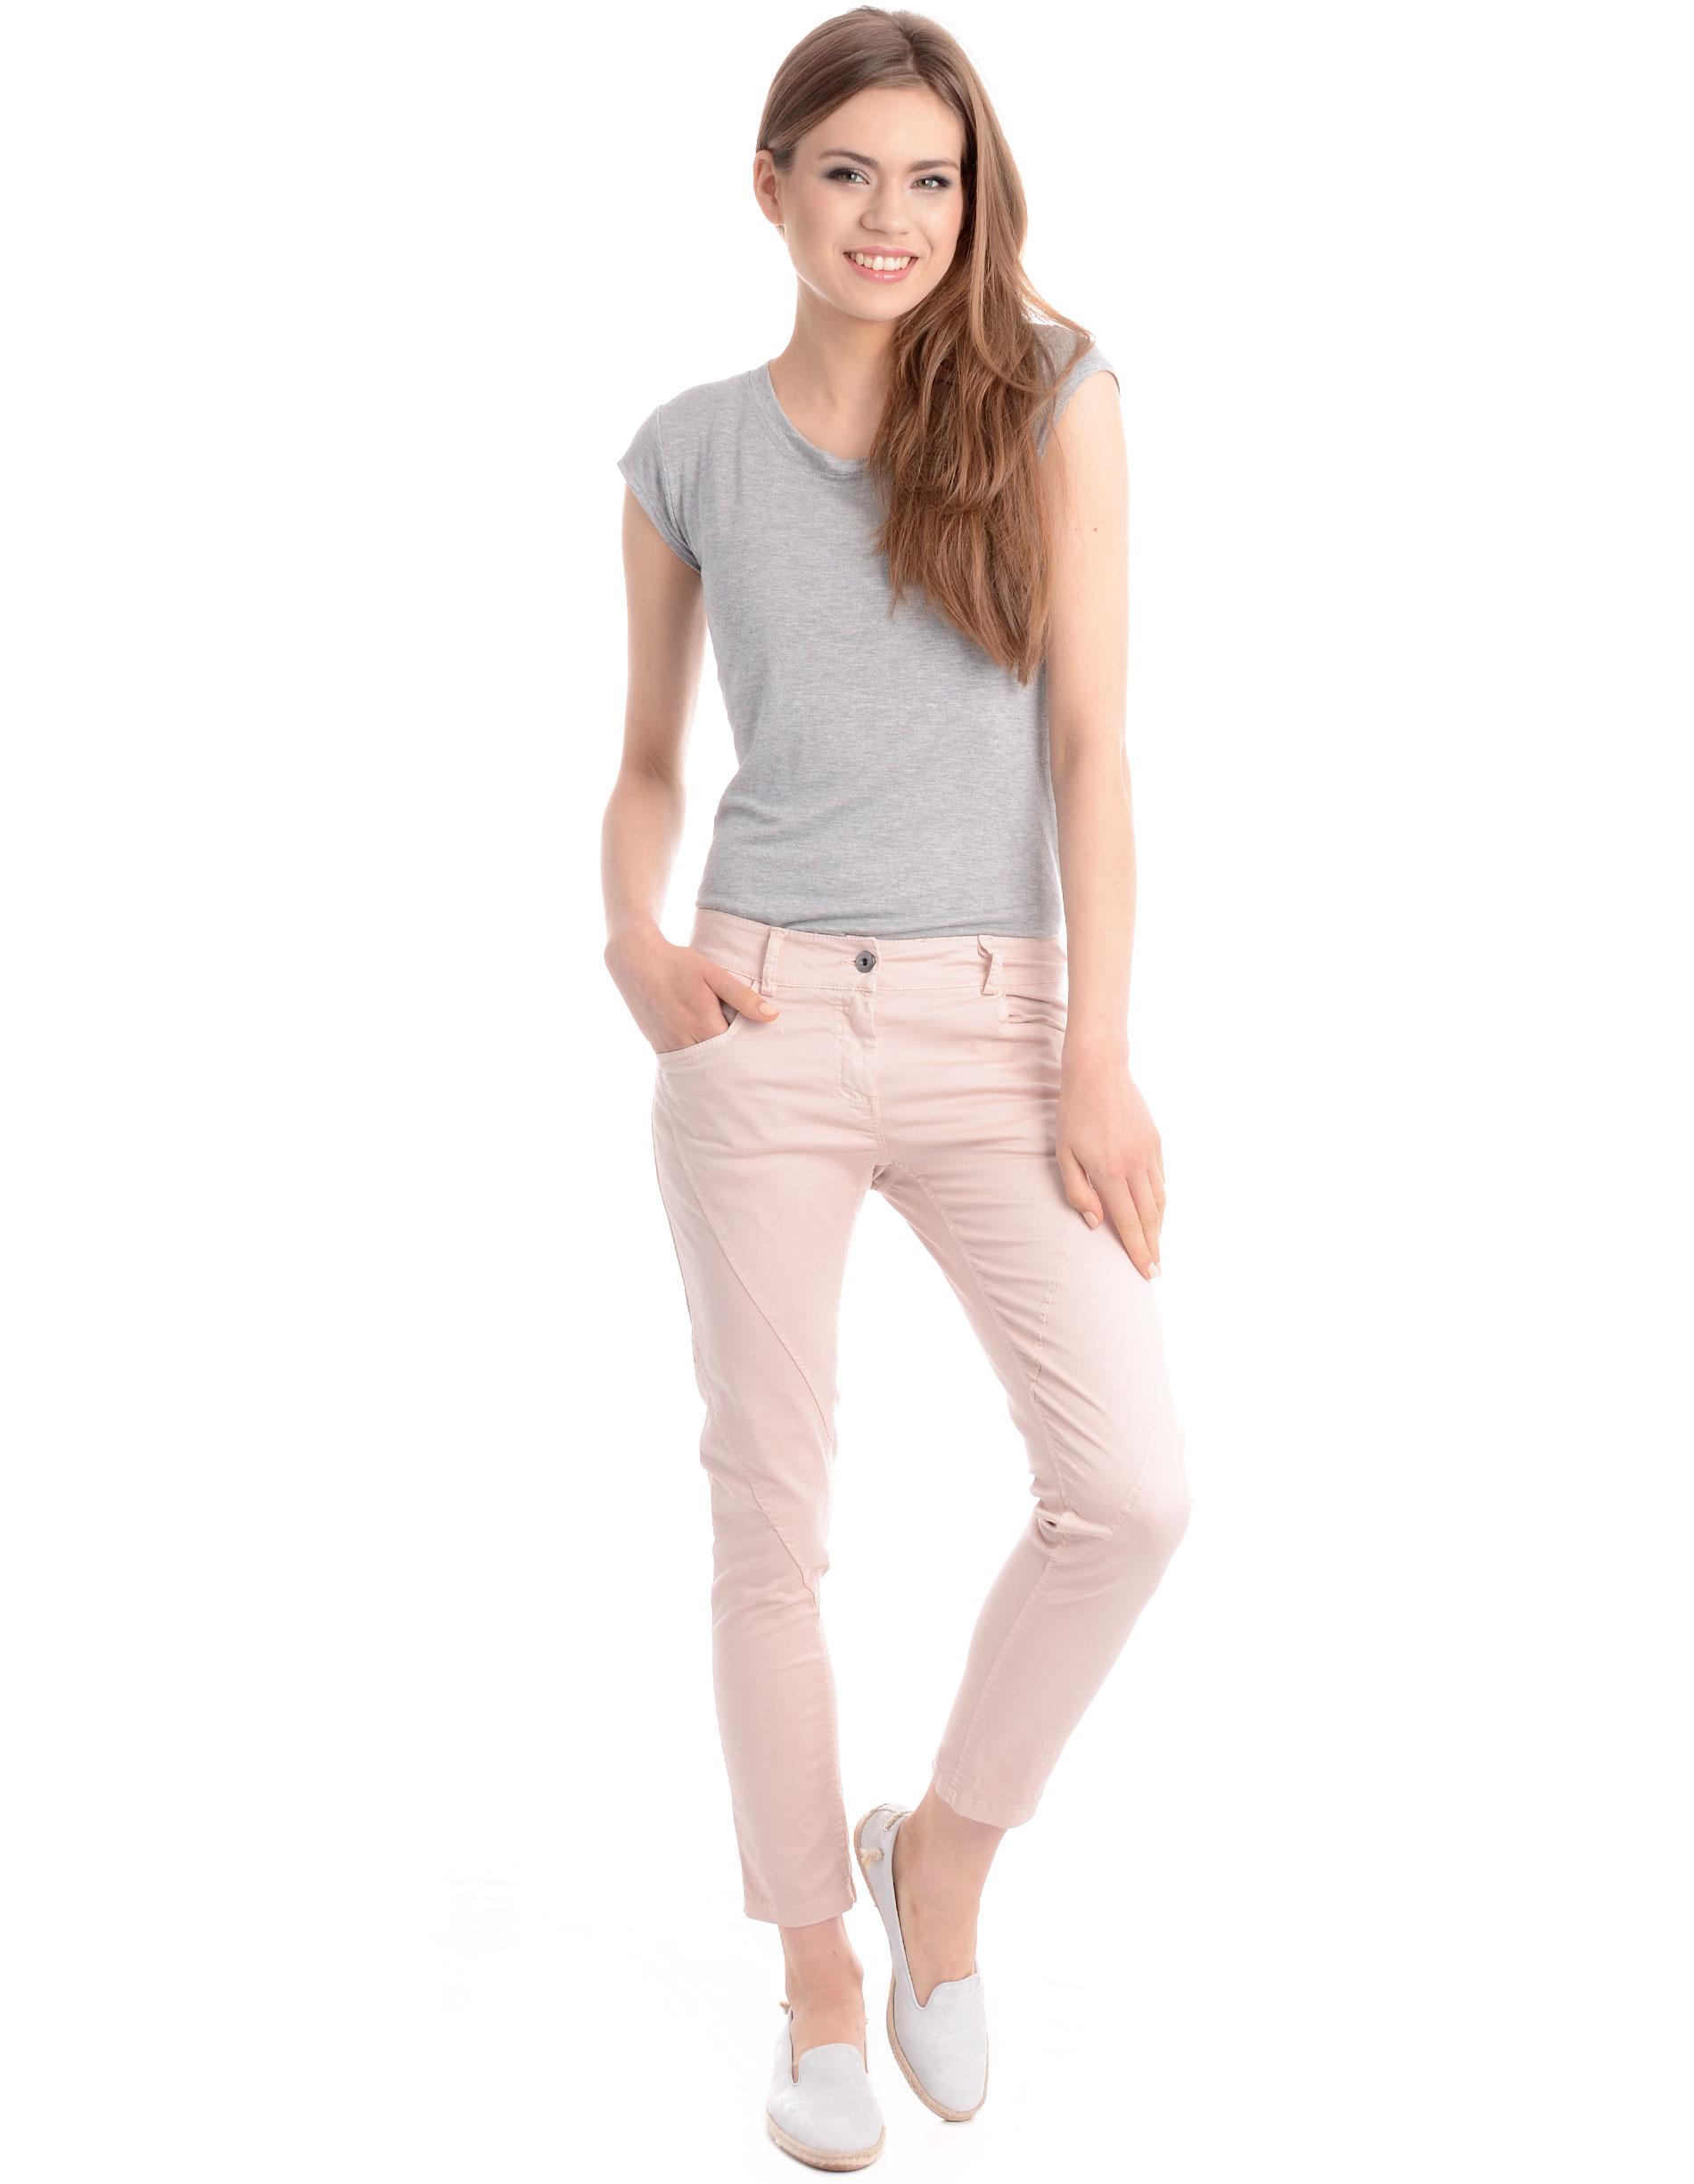 Spodnie - 30-16P273 ROS - Unisono